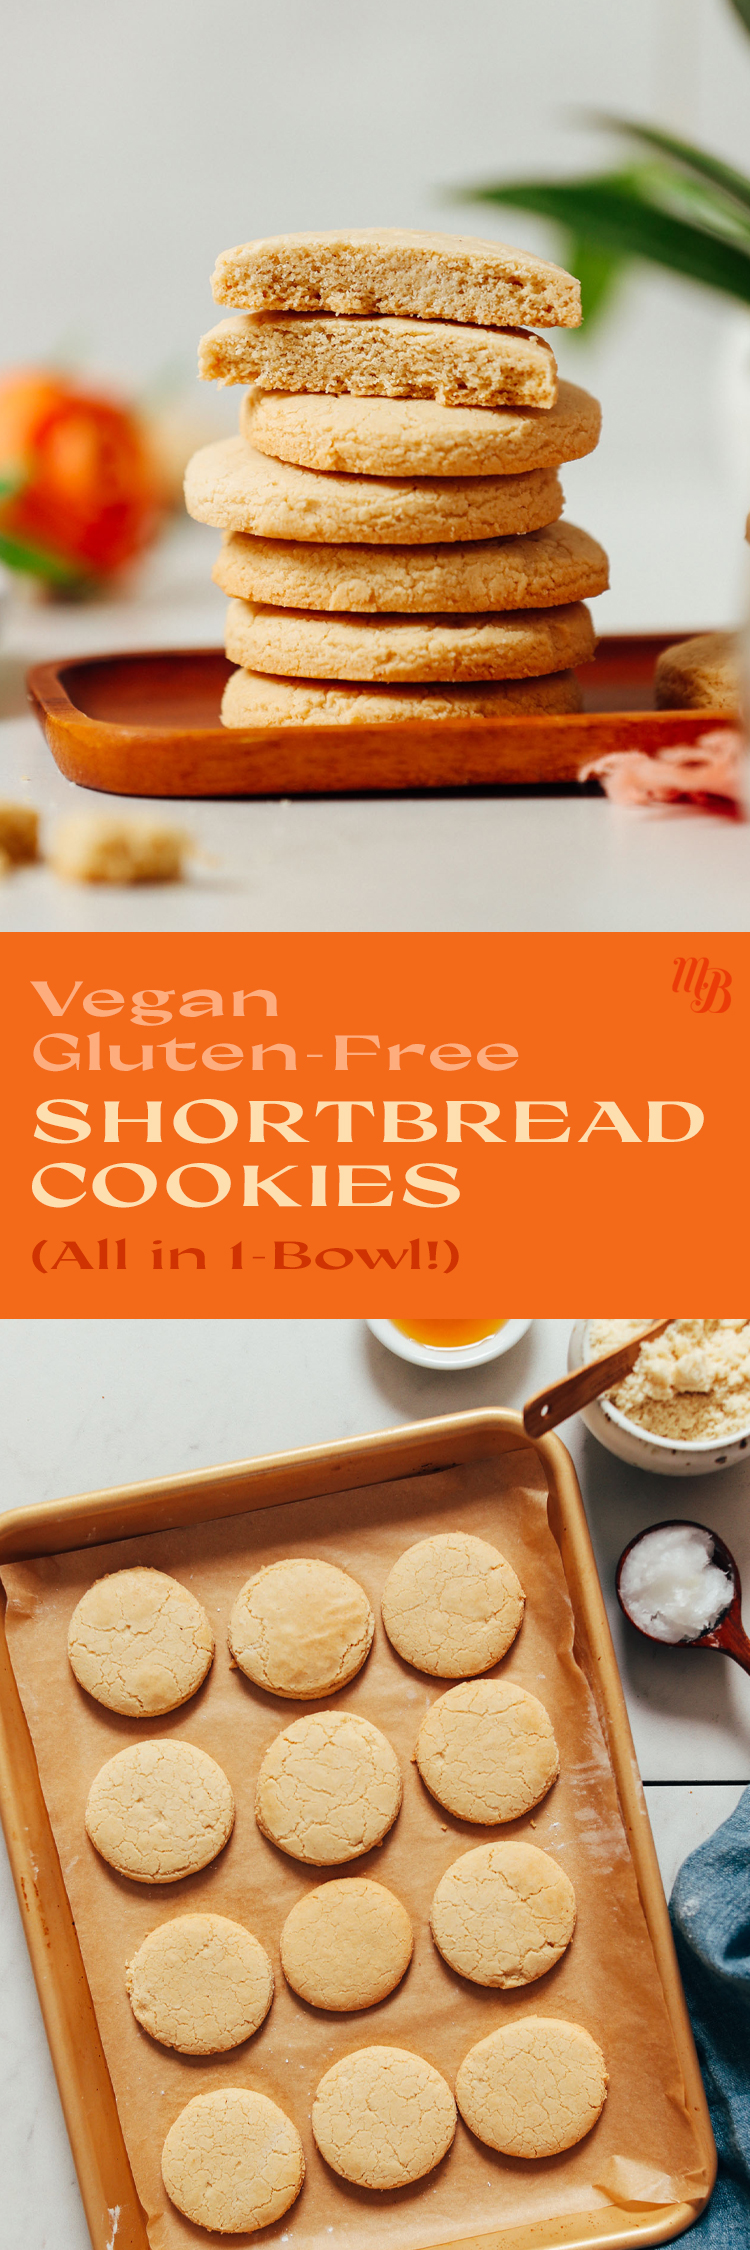 Pan de biscuits sablés vegan et sans gluten